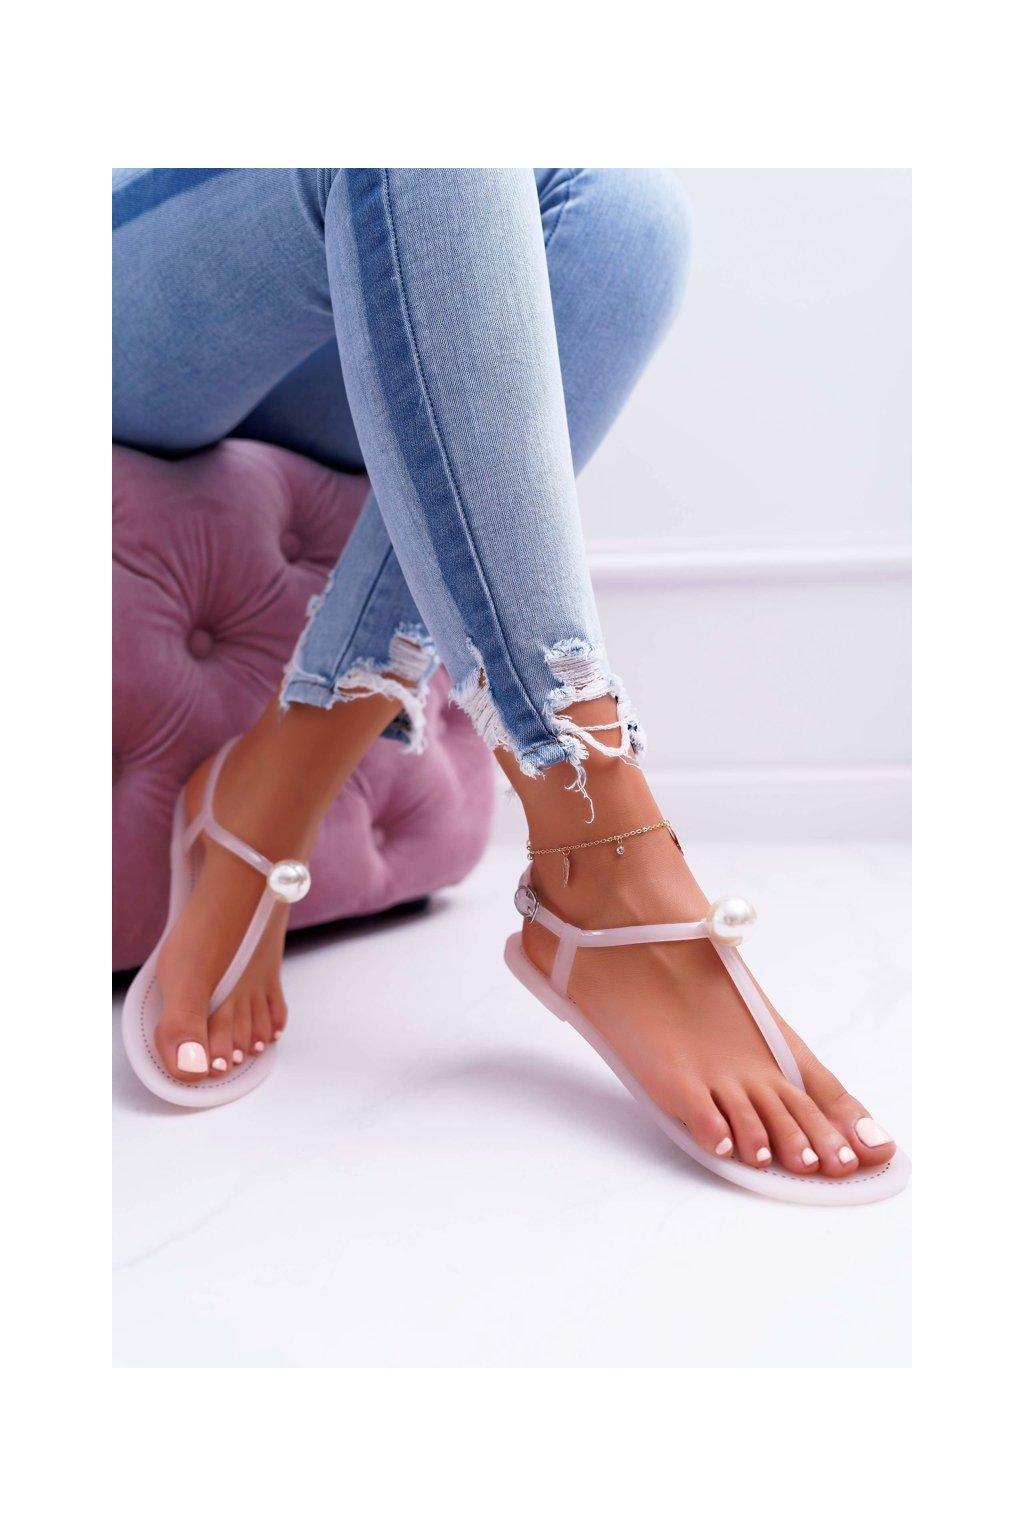 Dámske sandále Meliško s perlami ružové Contiro NJSK 96